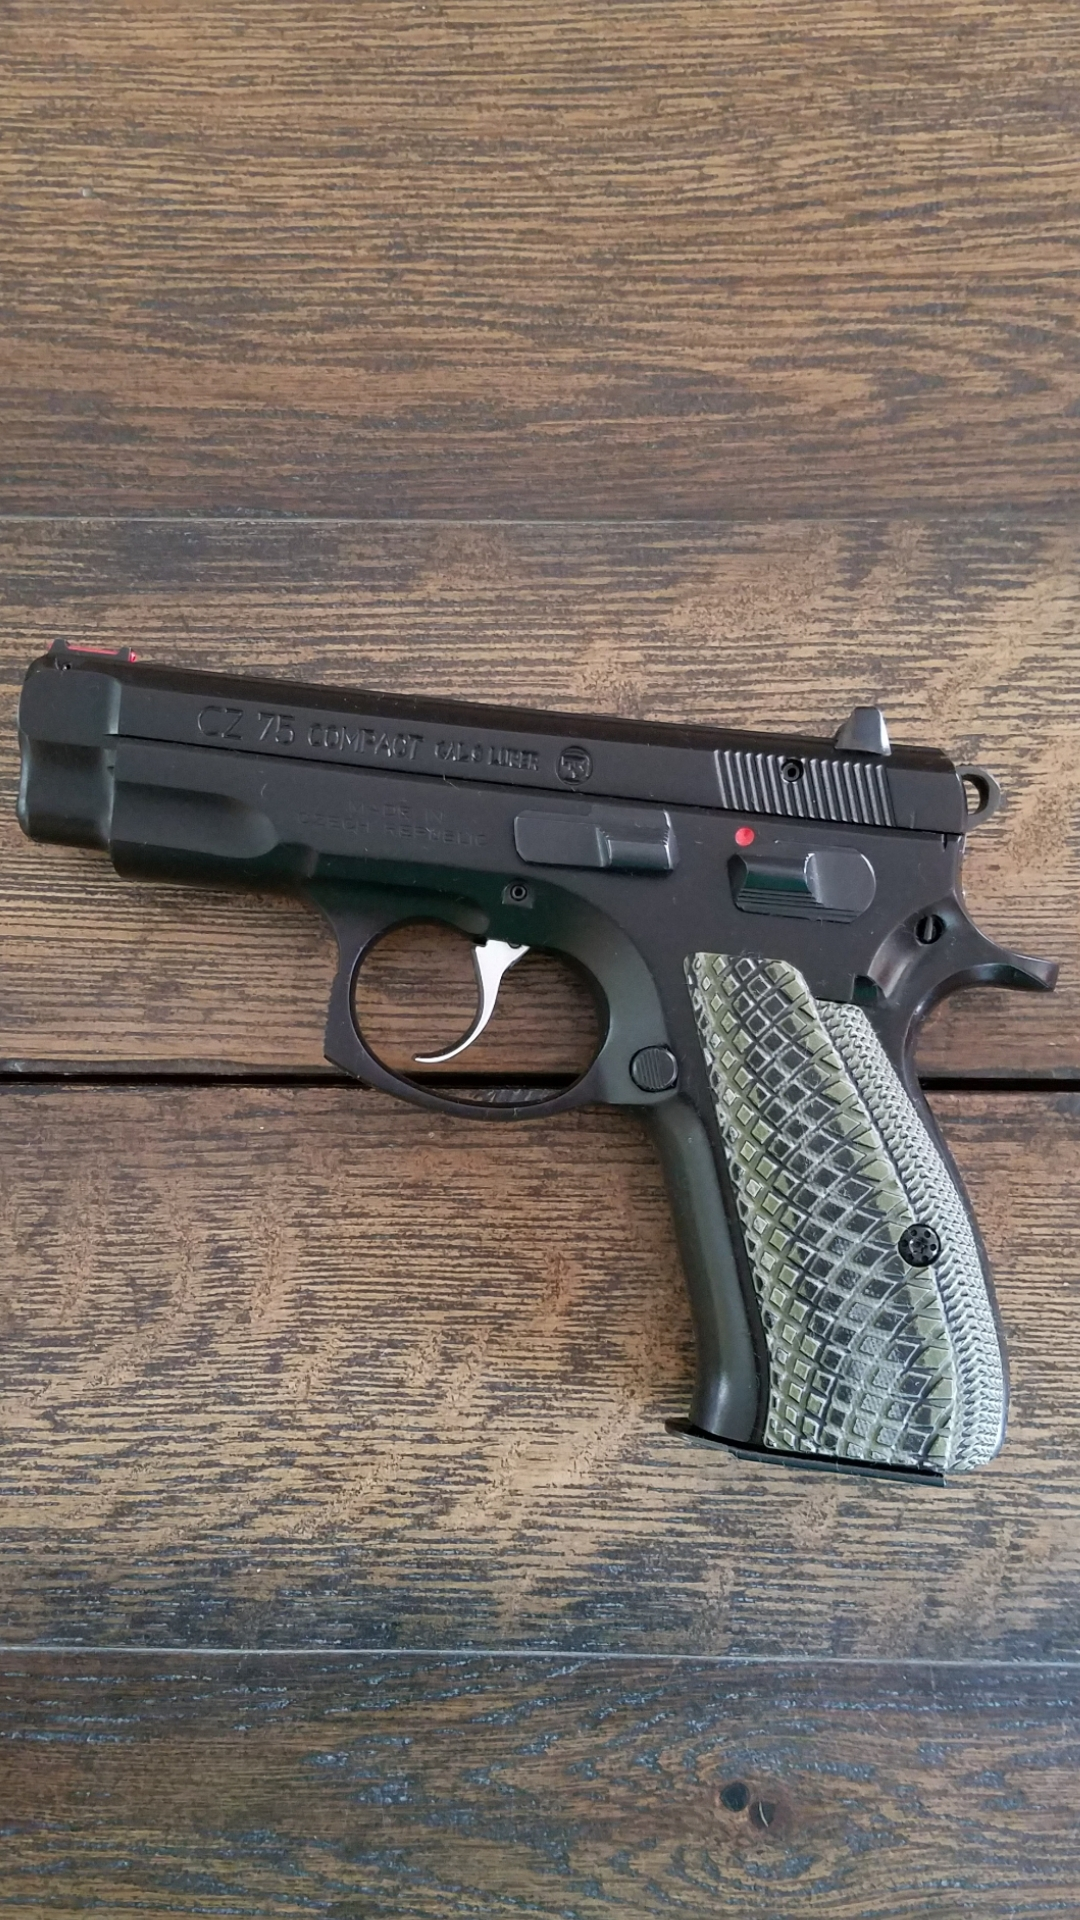 The 9mm Pistol Photo Thread-screenshot_20200409-120331_gallery_1586451855702.jpg